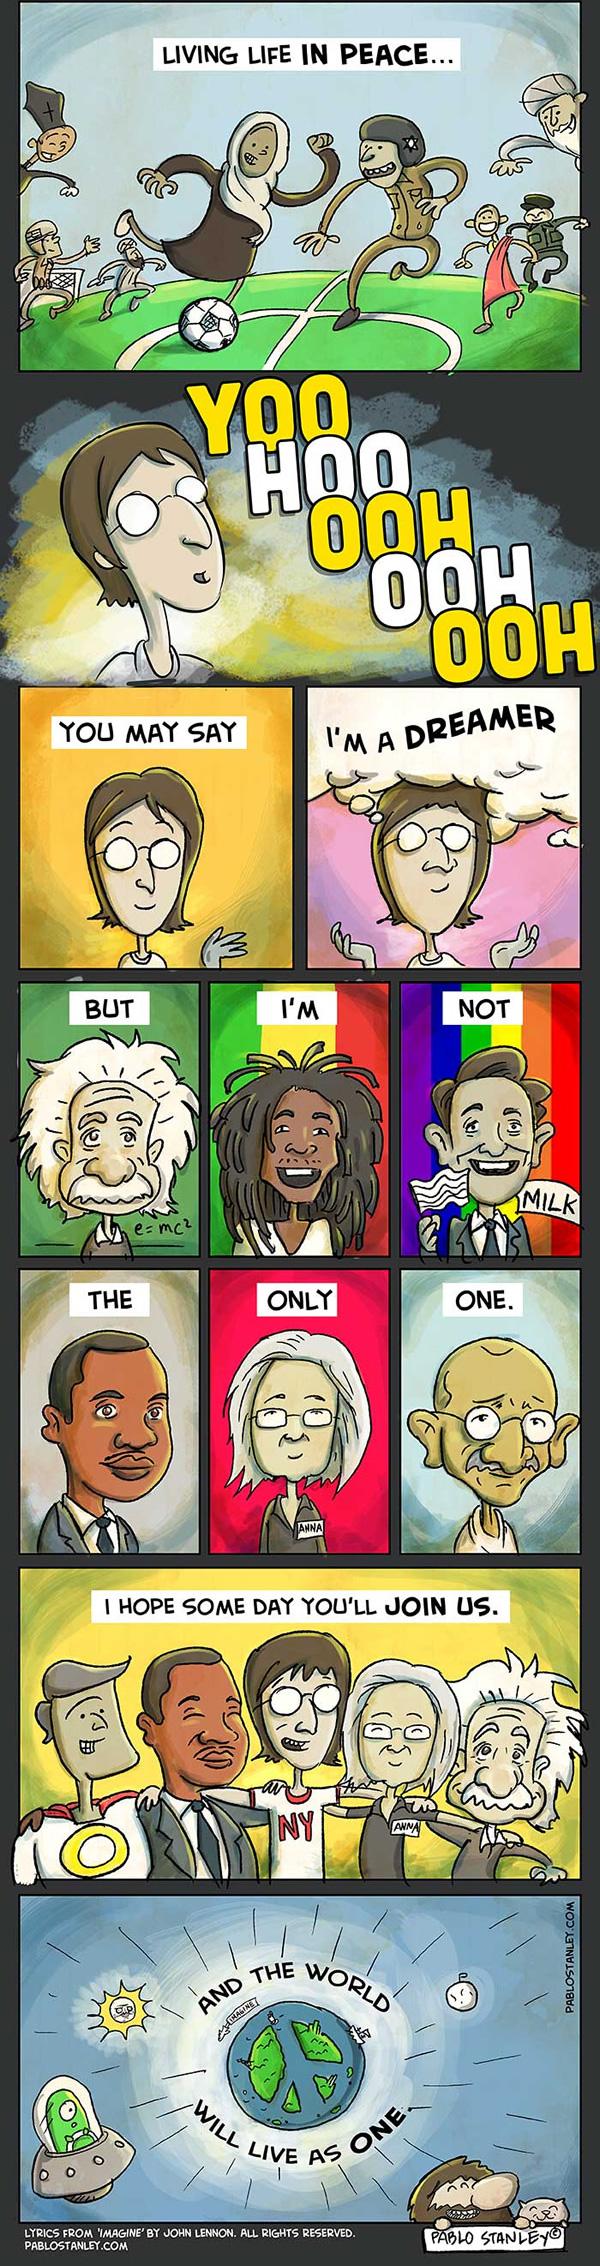 dinfo.gr - Καλλιτέχνης μετέτρεψε το Imagine του Τζον Λένον σε κόμικ. Διαβάστε το..